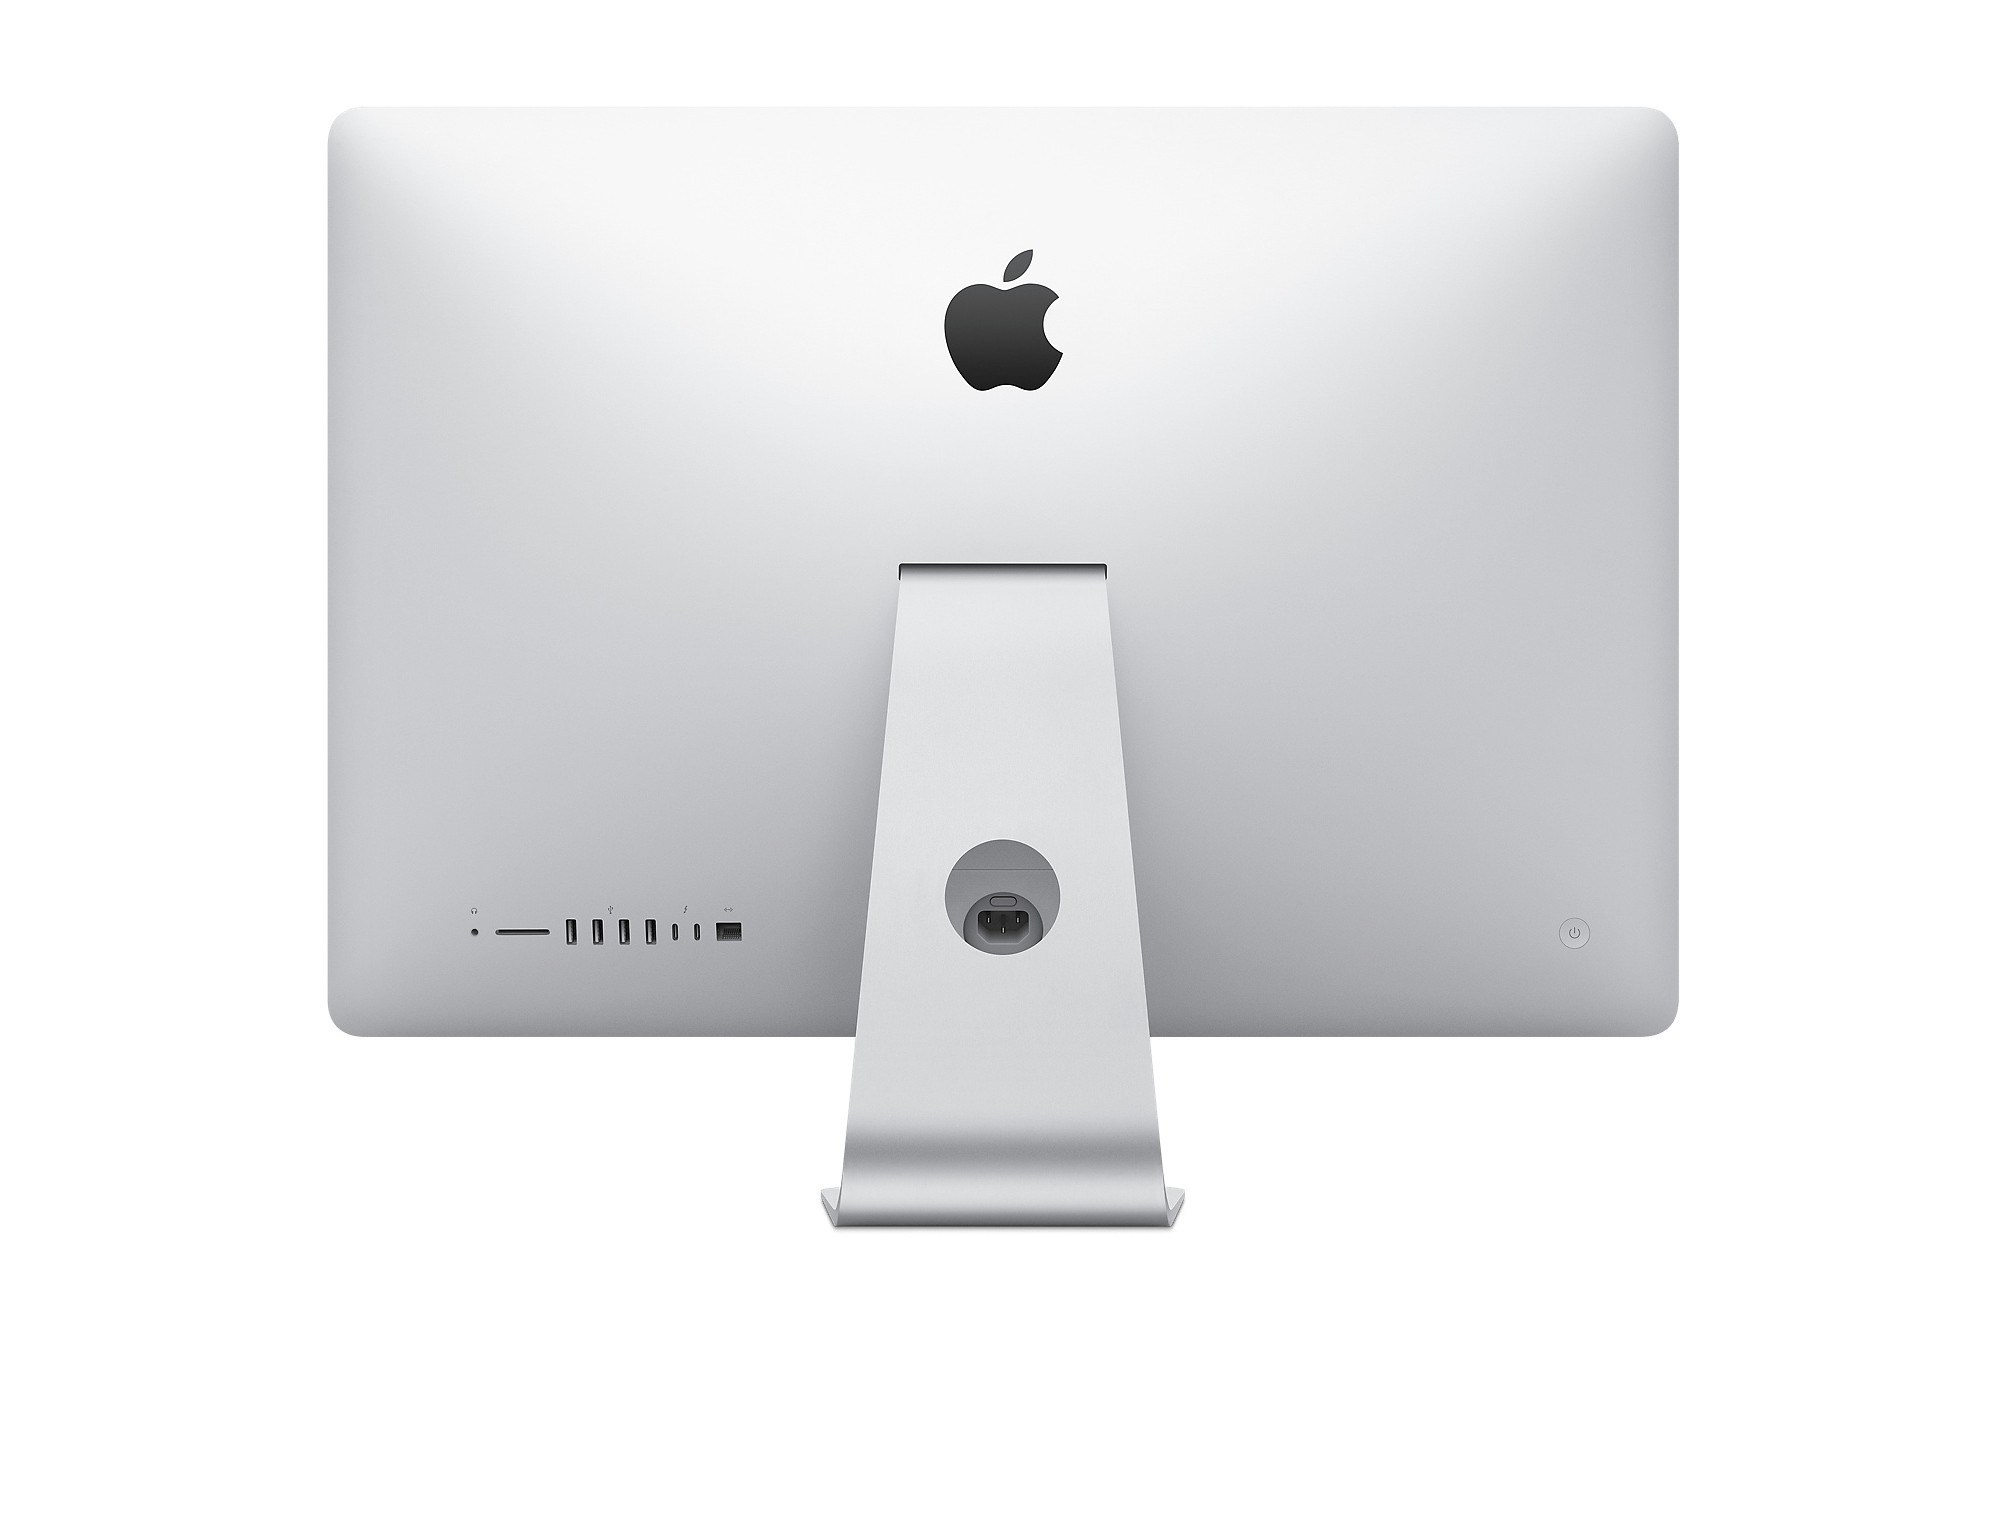 iMac 27 Inch 2020 - 3.6GHz 10-Core i9 16GB 512GB Radeon Pro 5500 XT 8GB